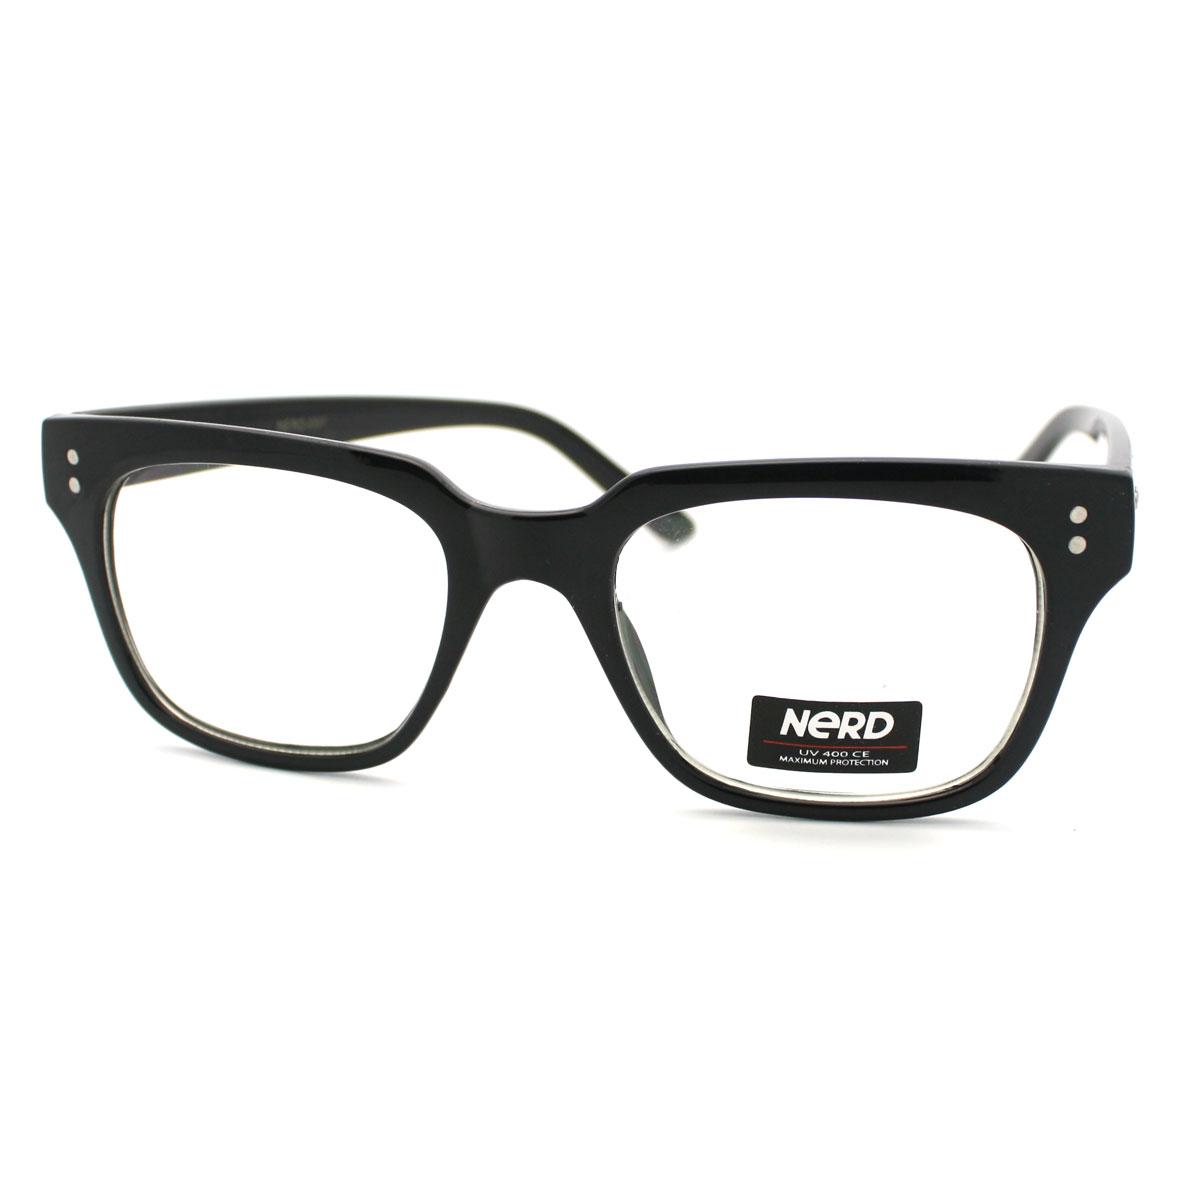 Glasses Frames Black On Top Clear On Bottom : Clear Lens Horned Rim Retro Eye Glasses Frame with Metal ...